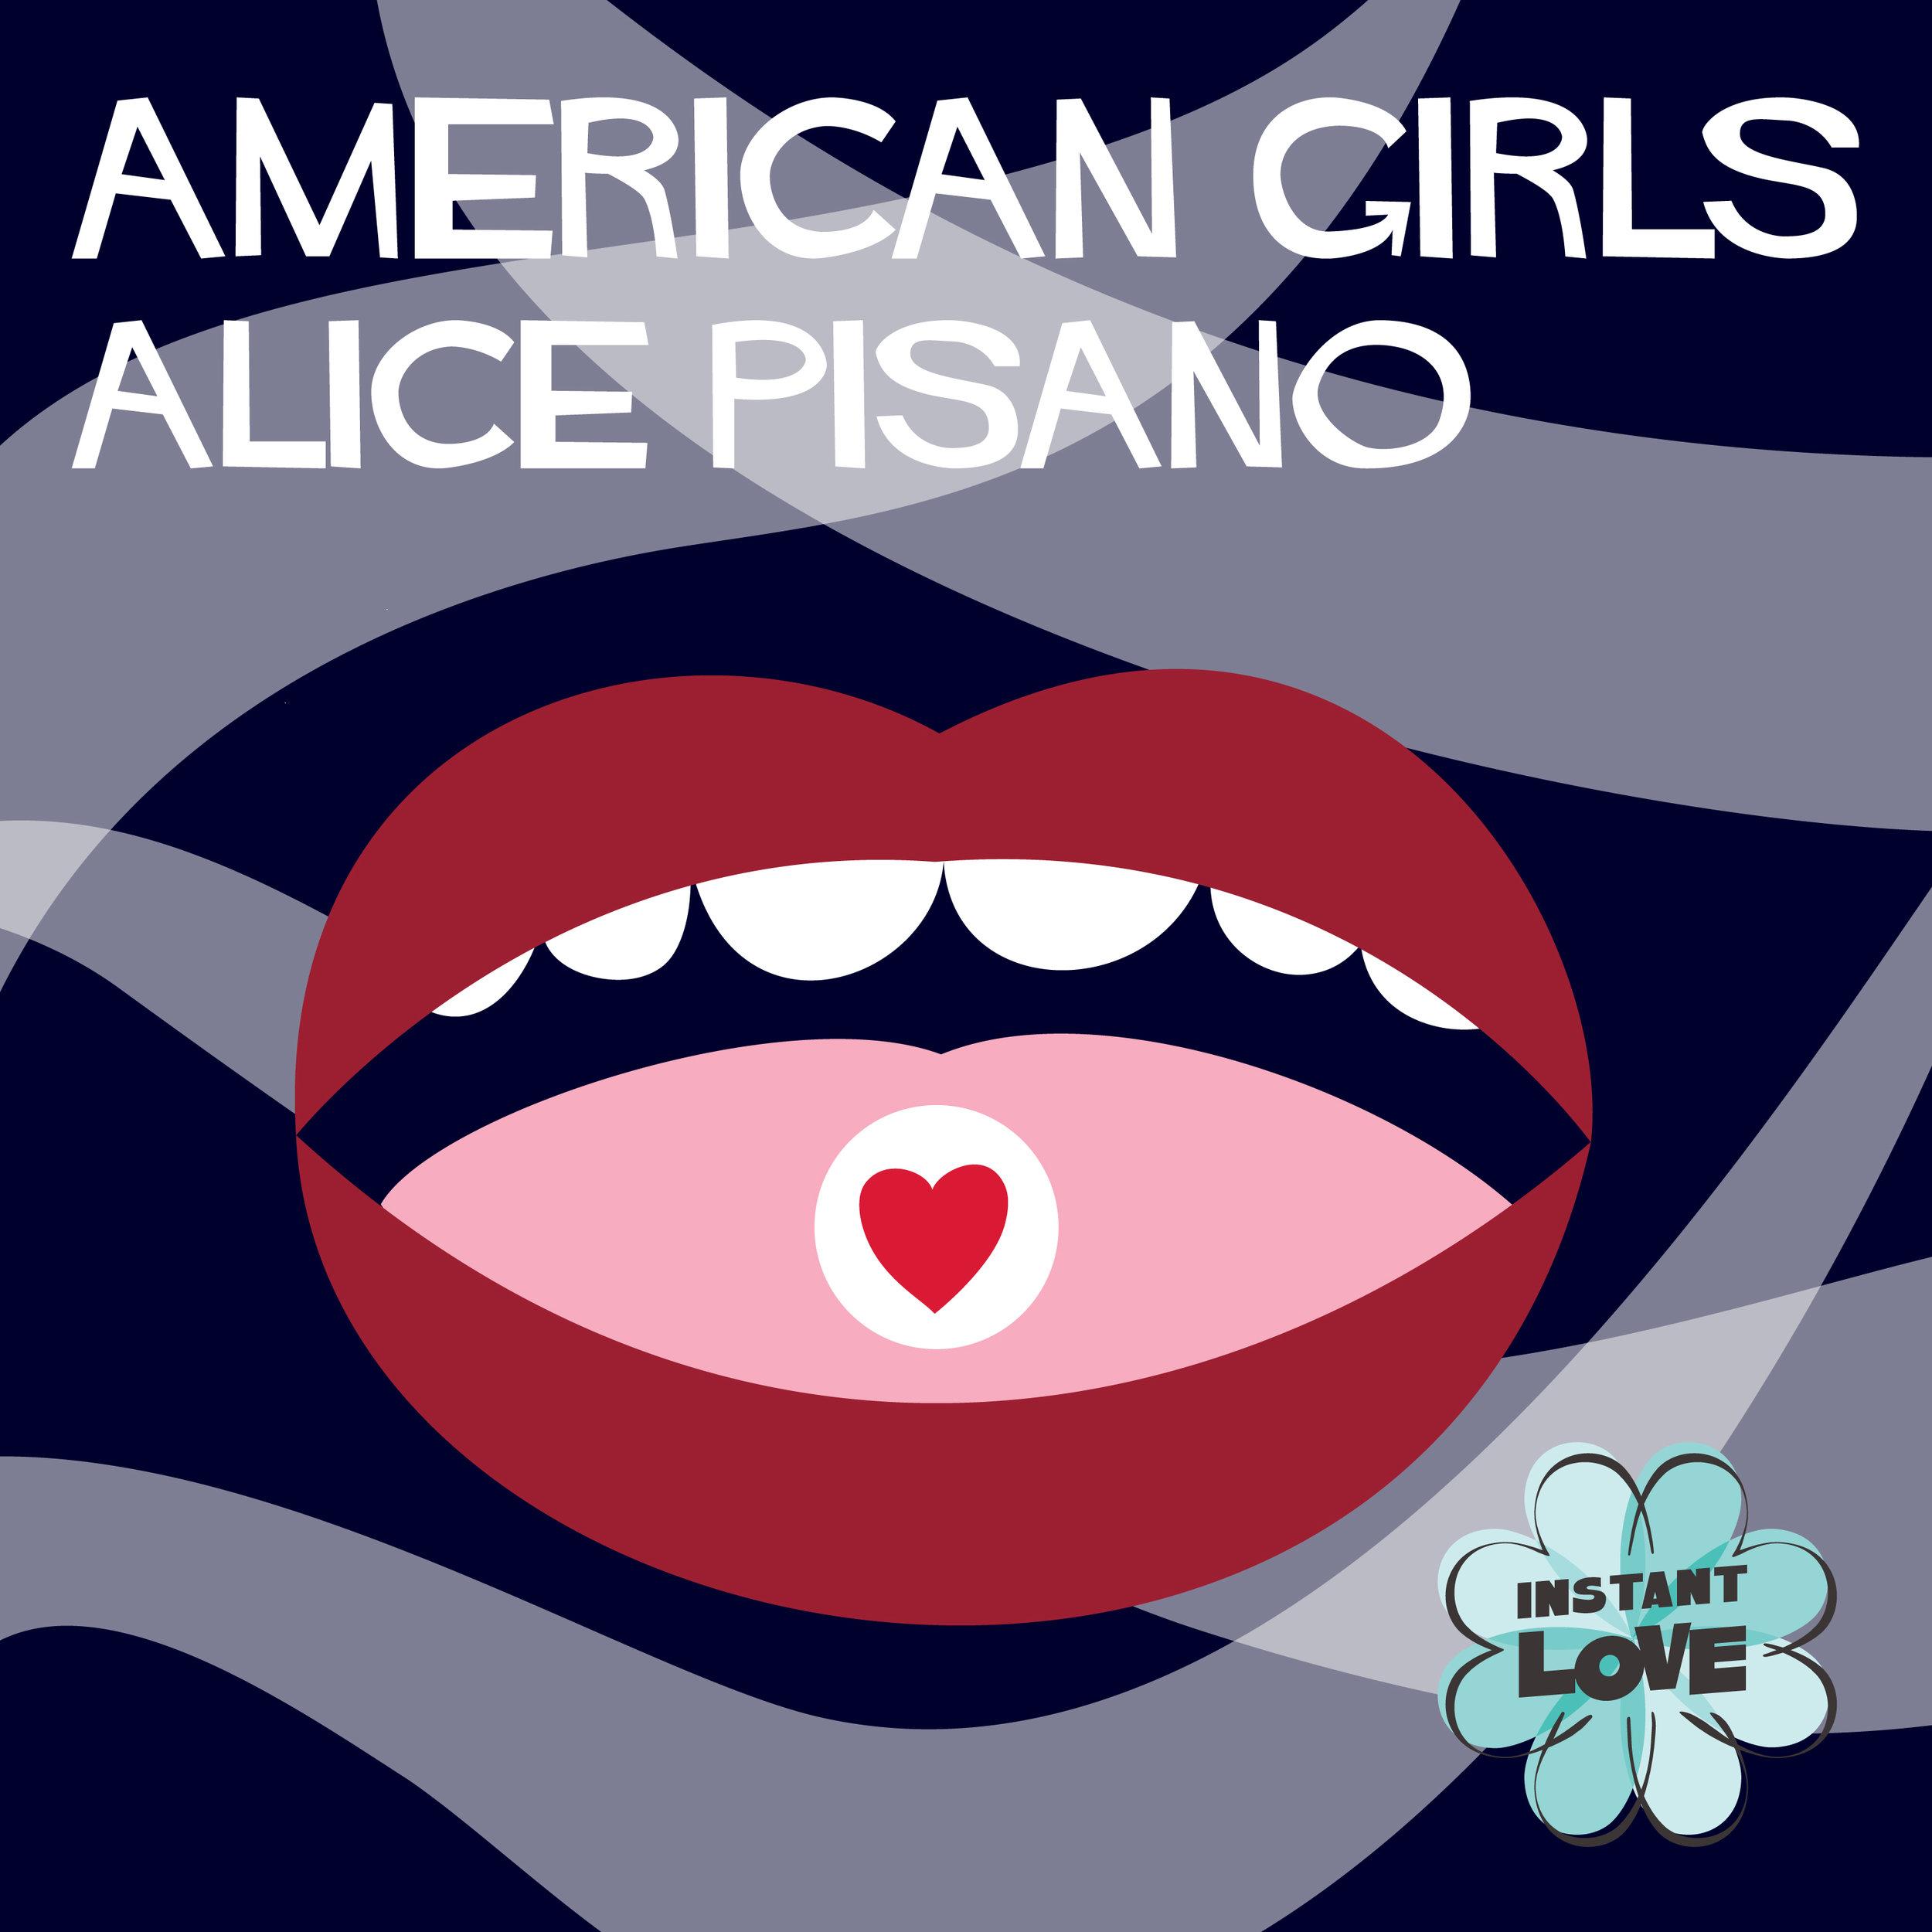 American Girls_Alice Pisano.jpg